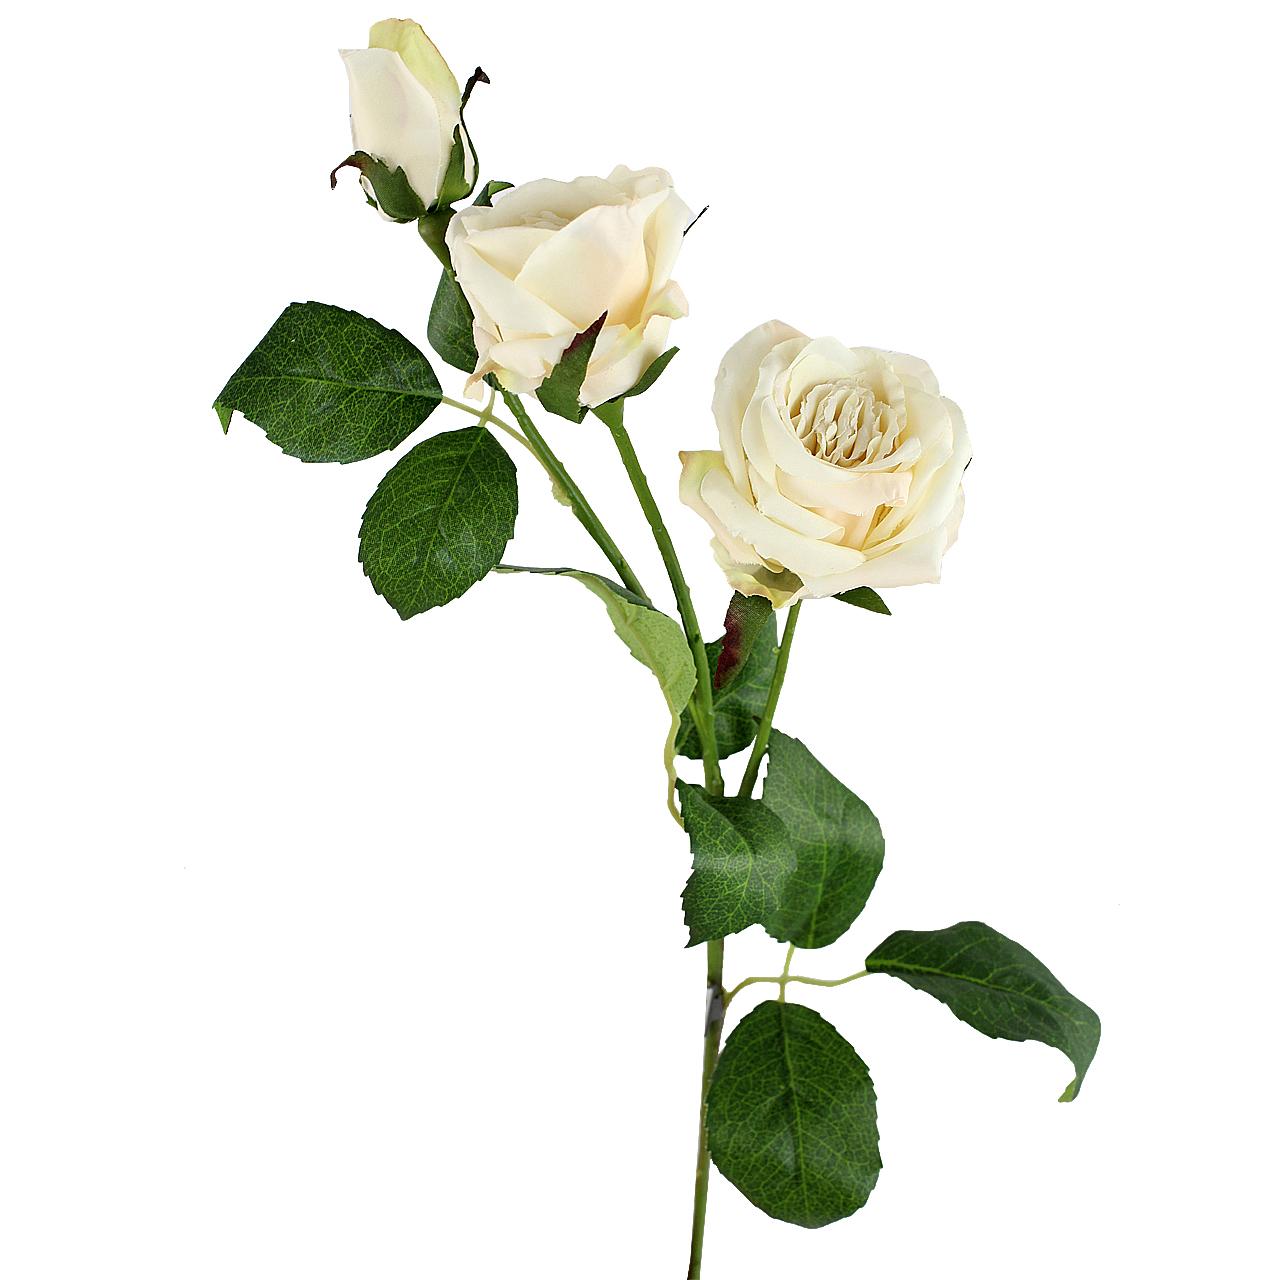 Floare Artificiala Trandafir Alb 55 Cm